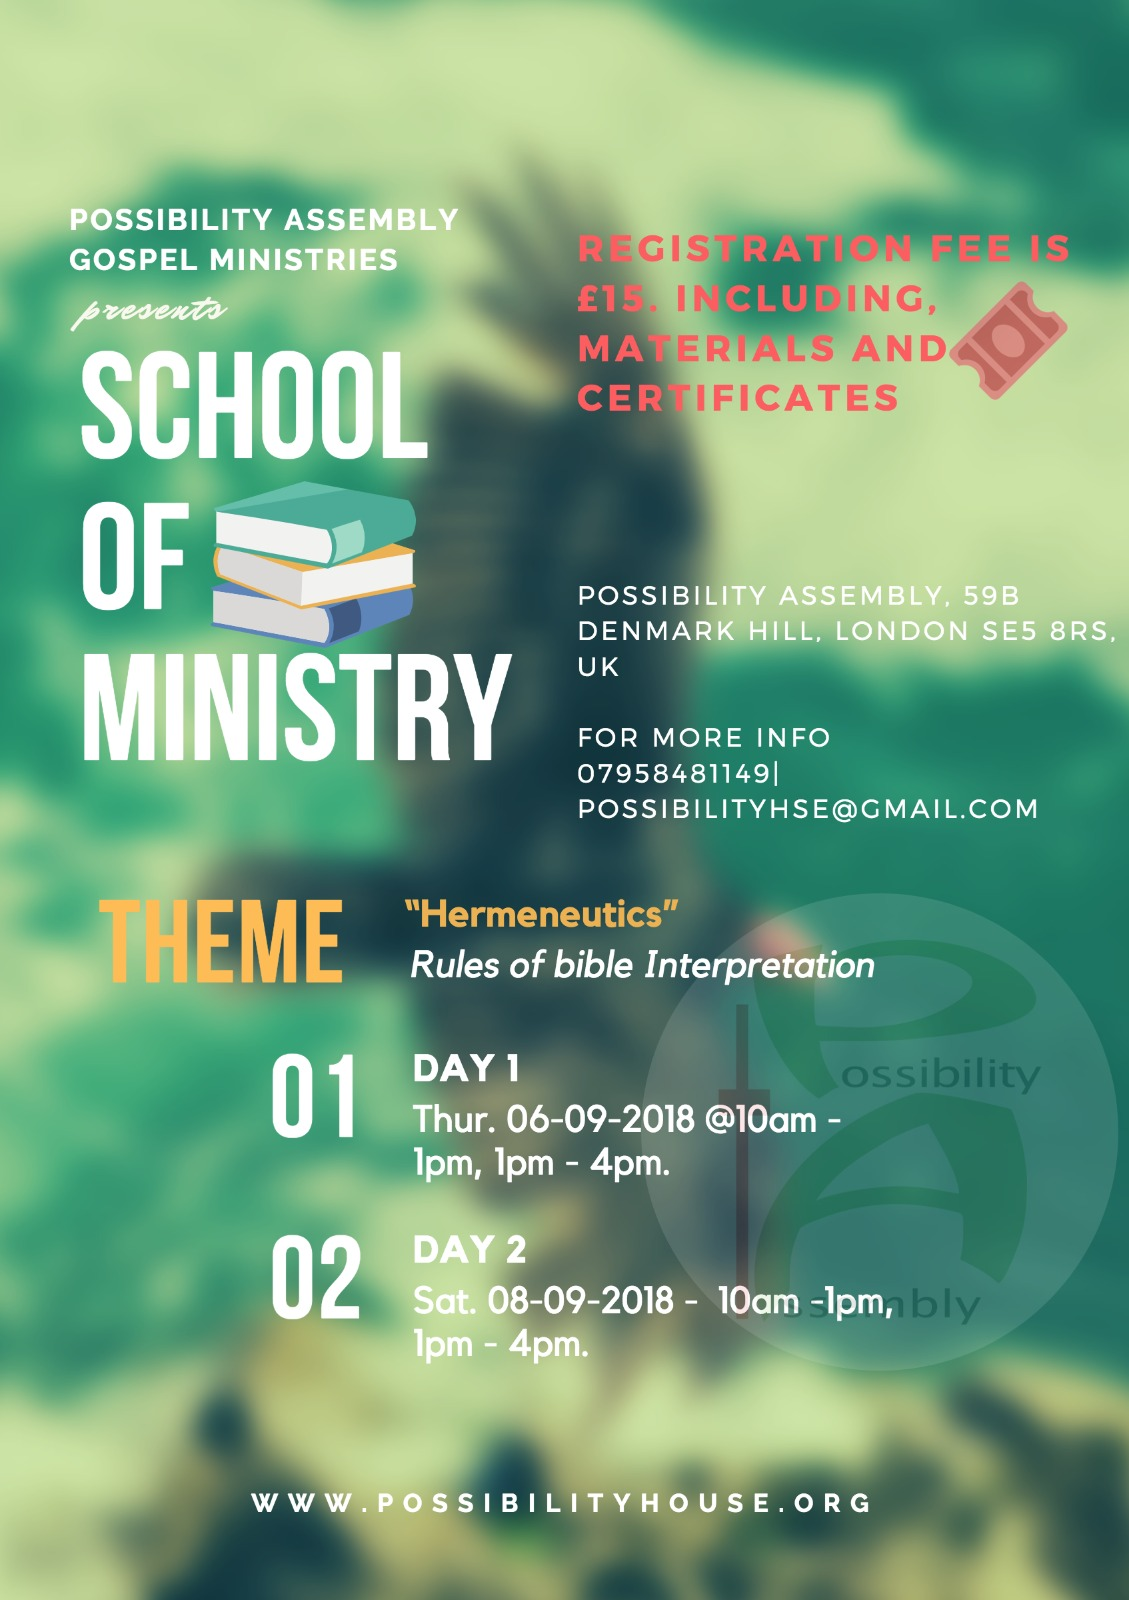 pentecostal rules and regulations